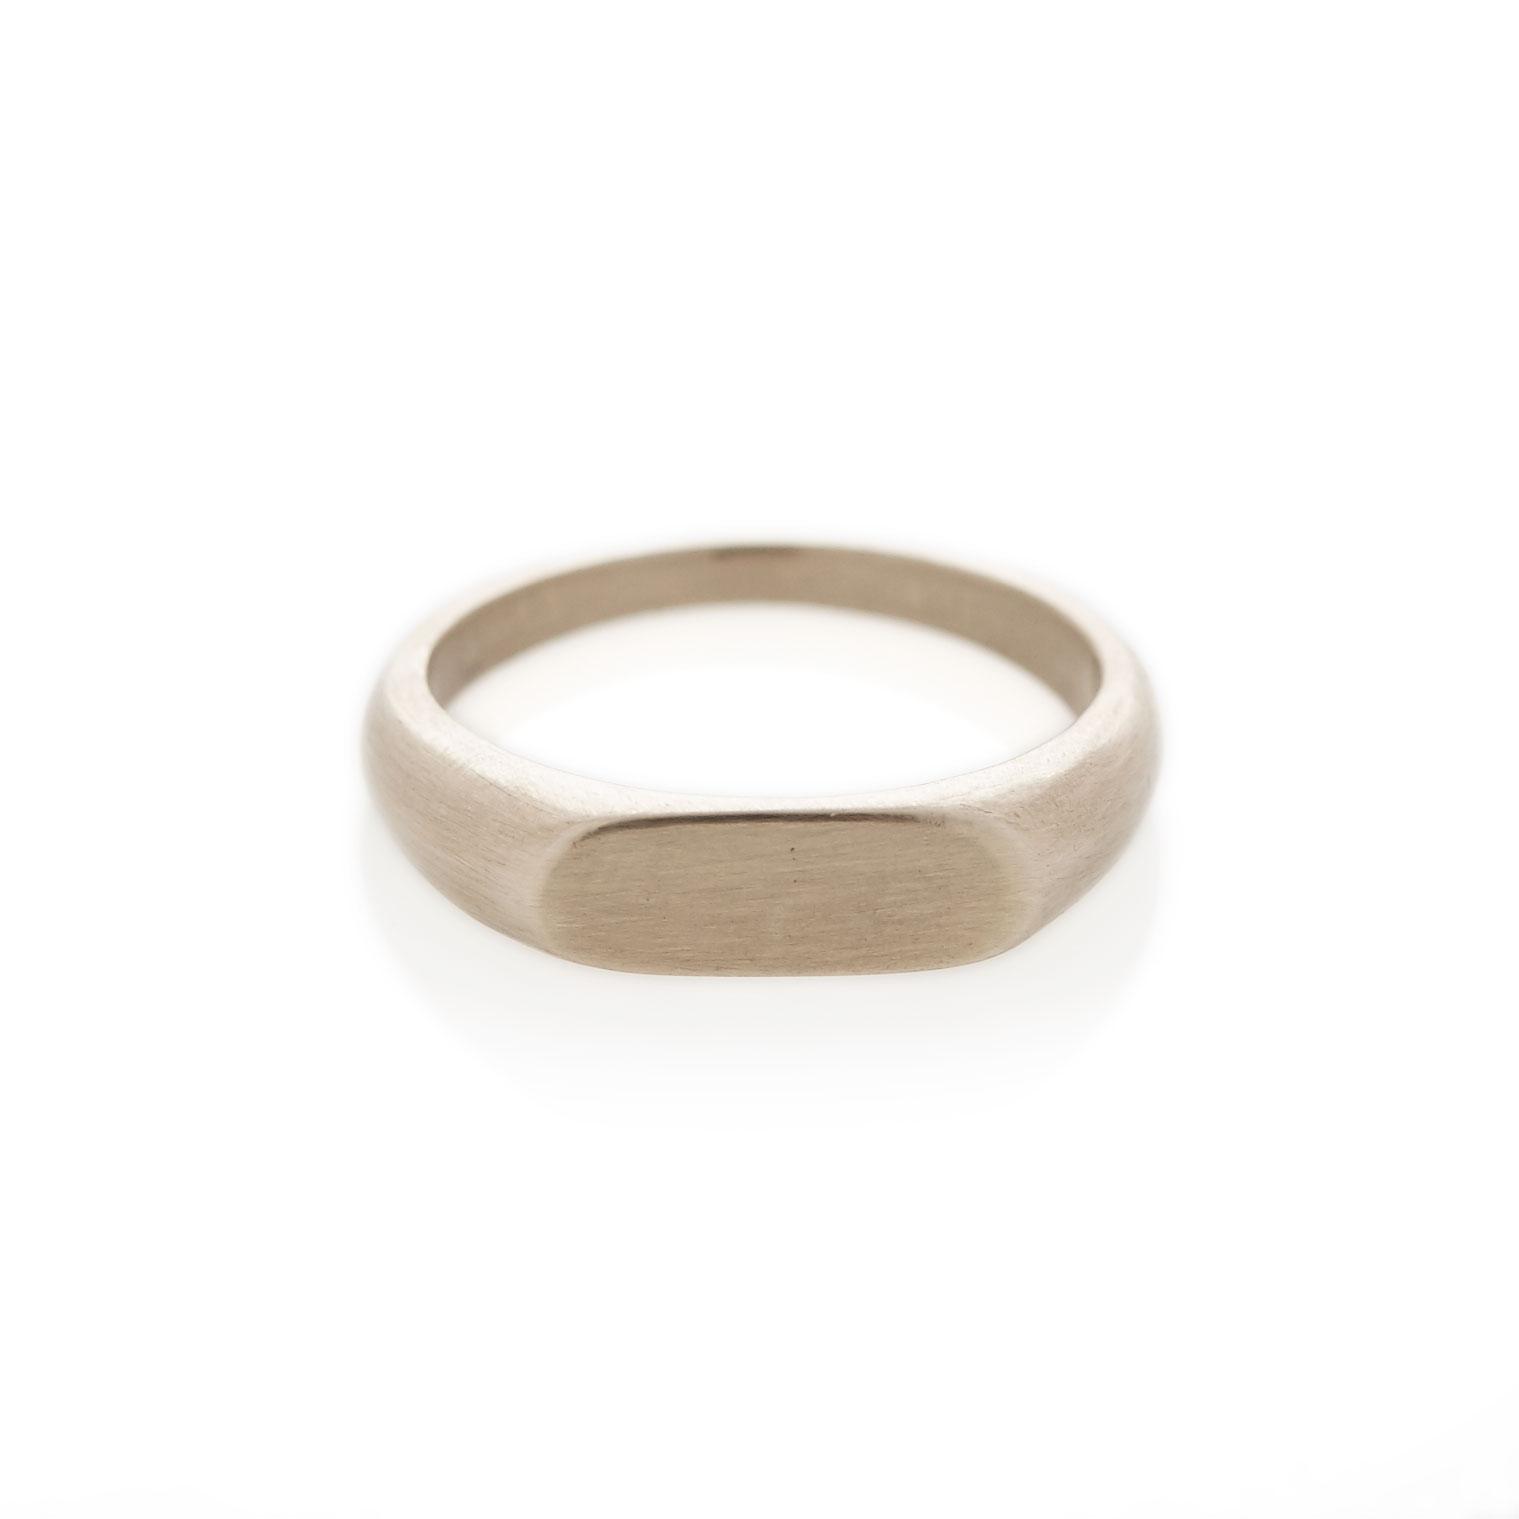 9ct white gold landscape signet ring